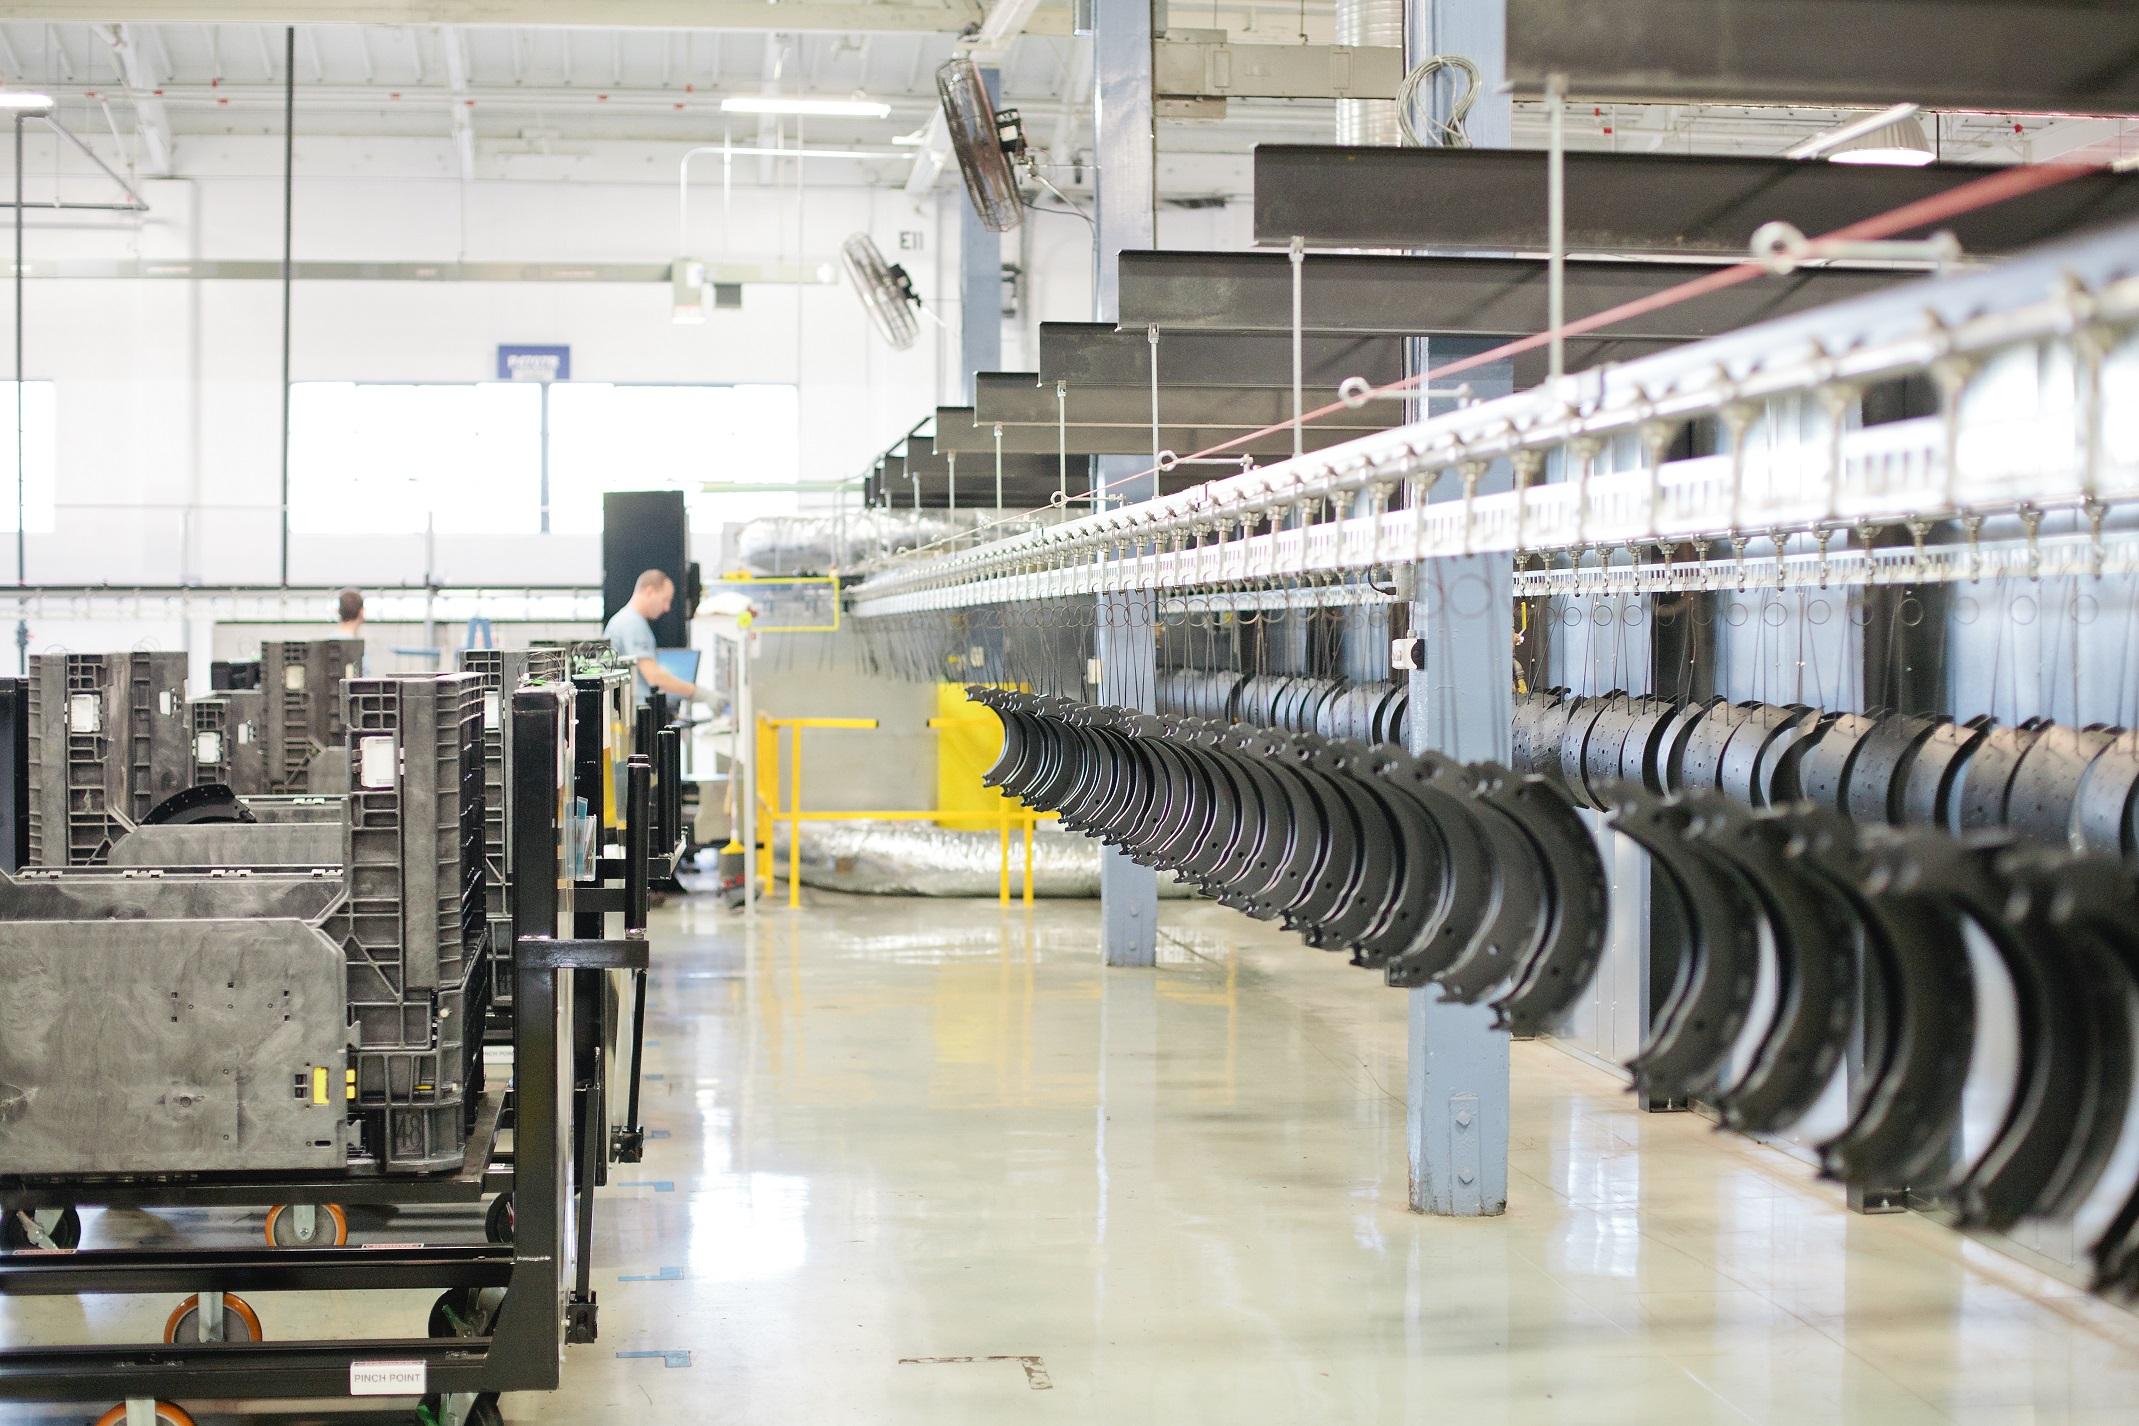 Bendix Makes Seven Millionth Remanufactured Brake